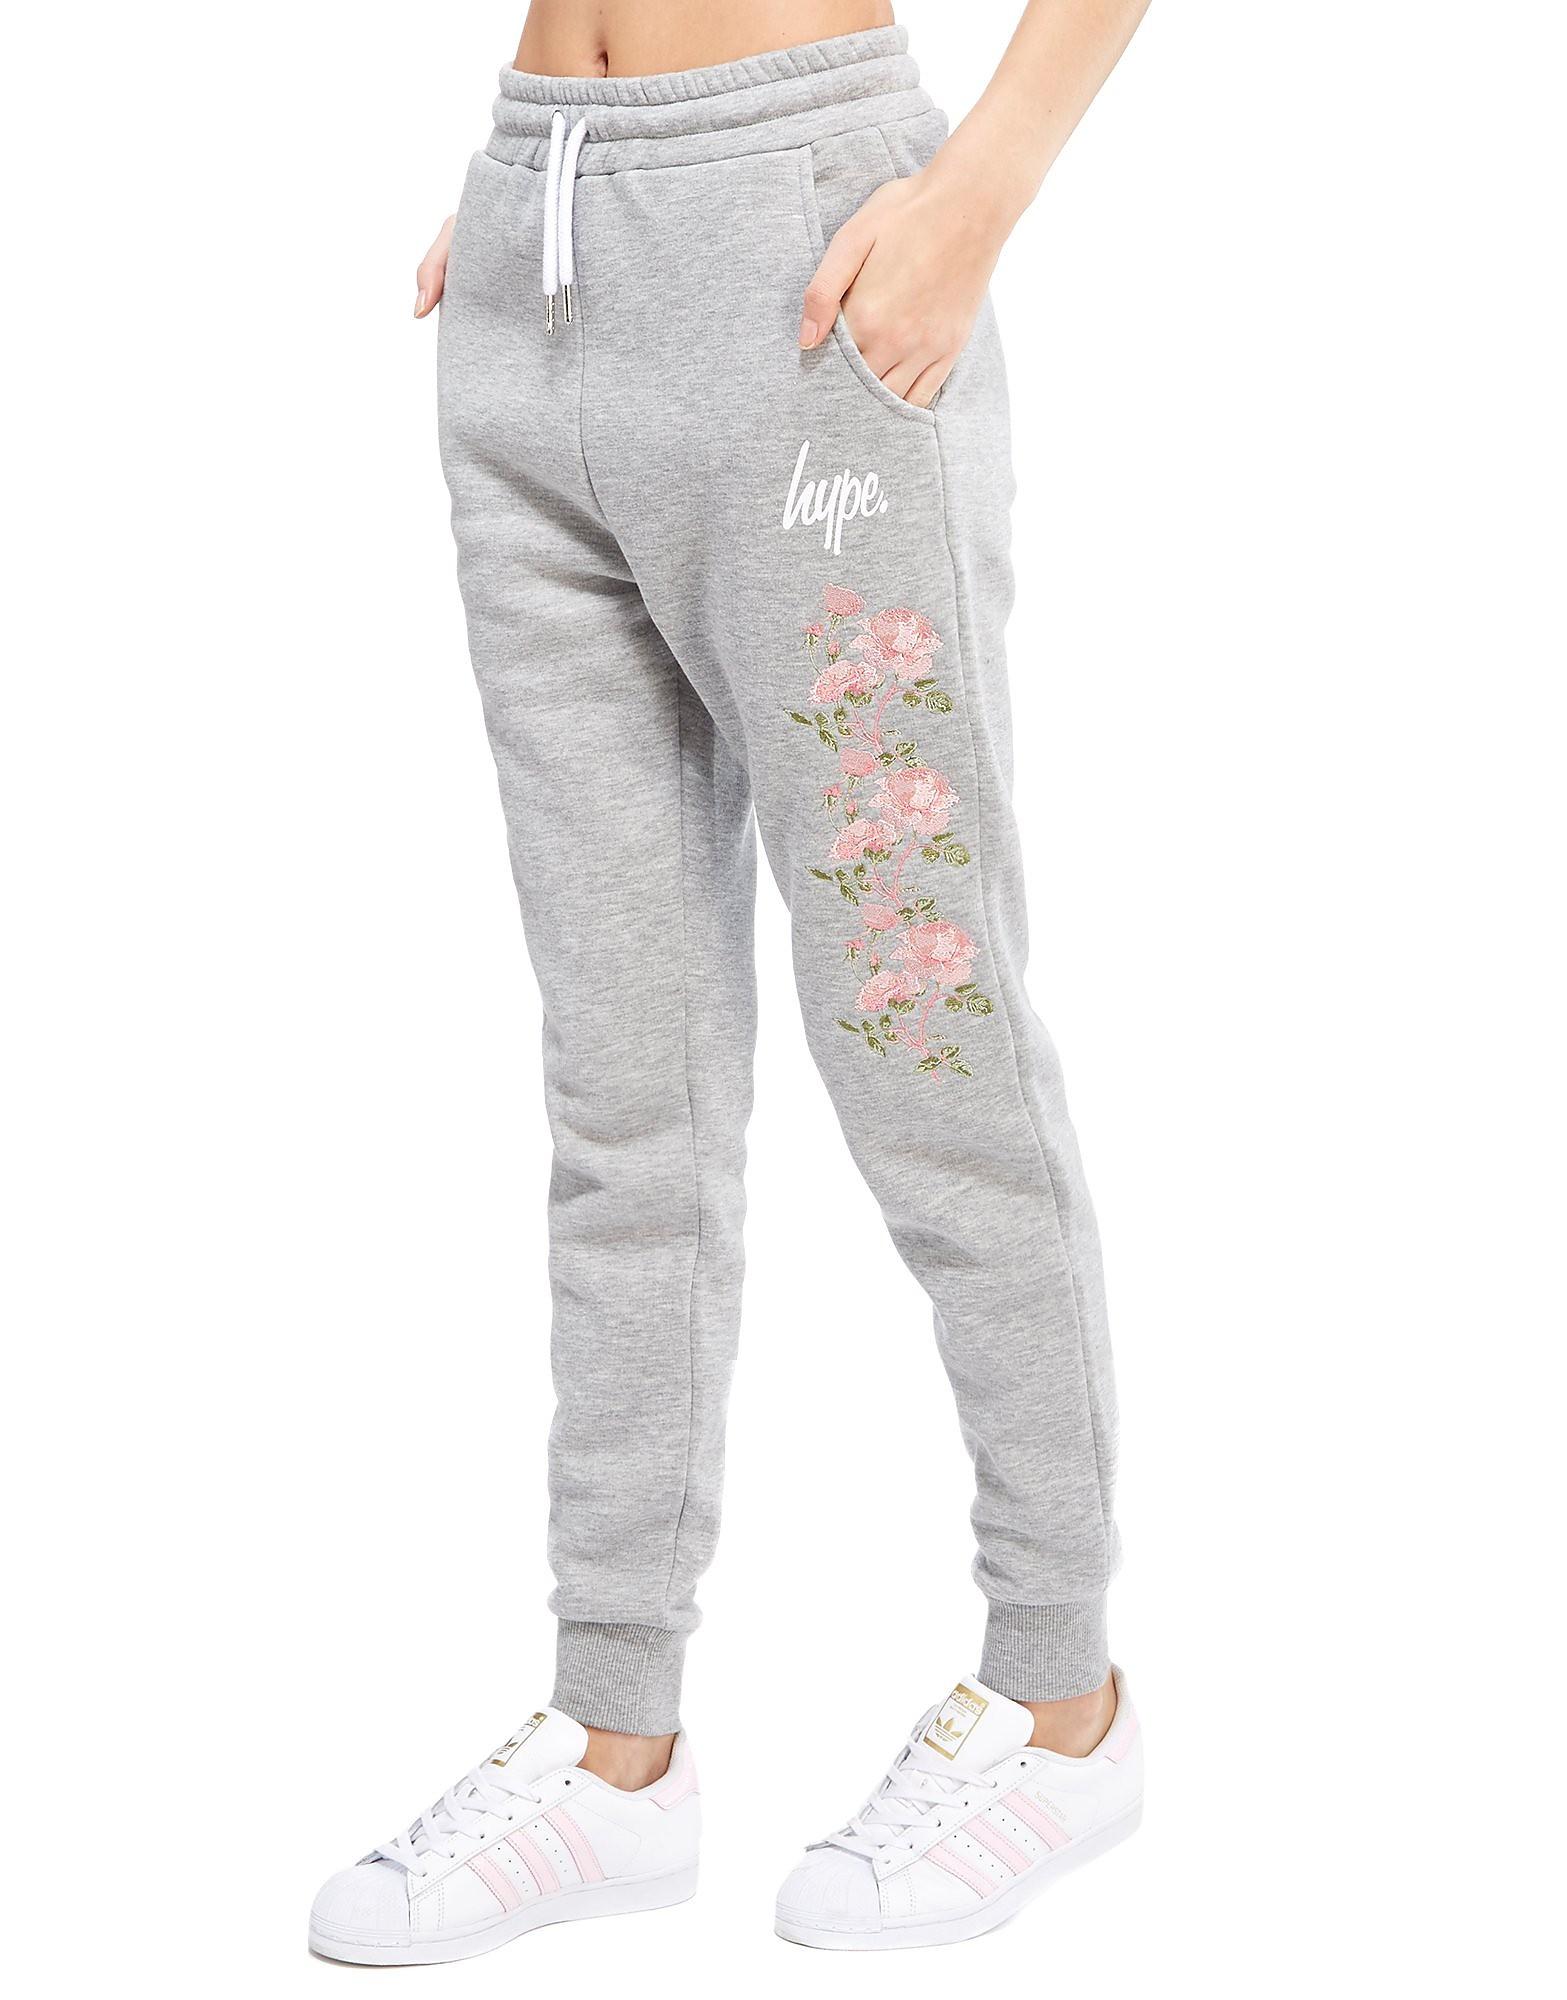 Hype Floral Fleece Pants